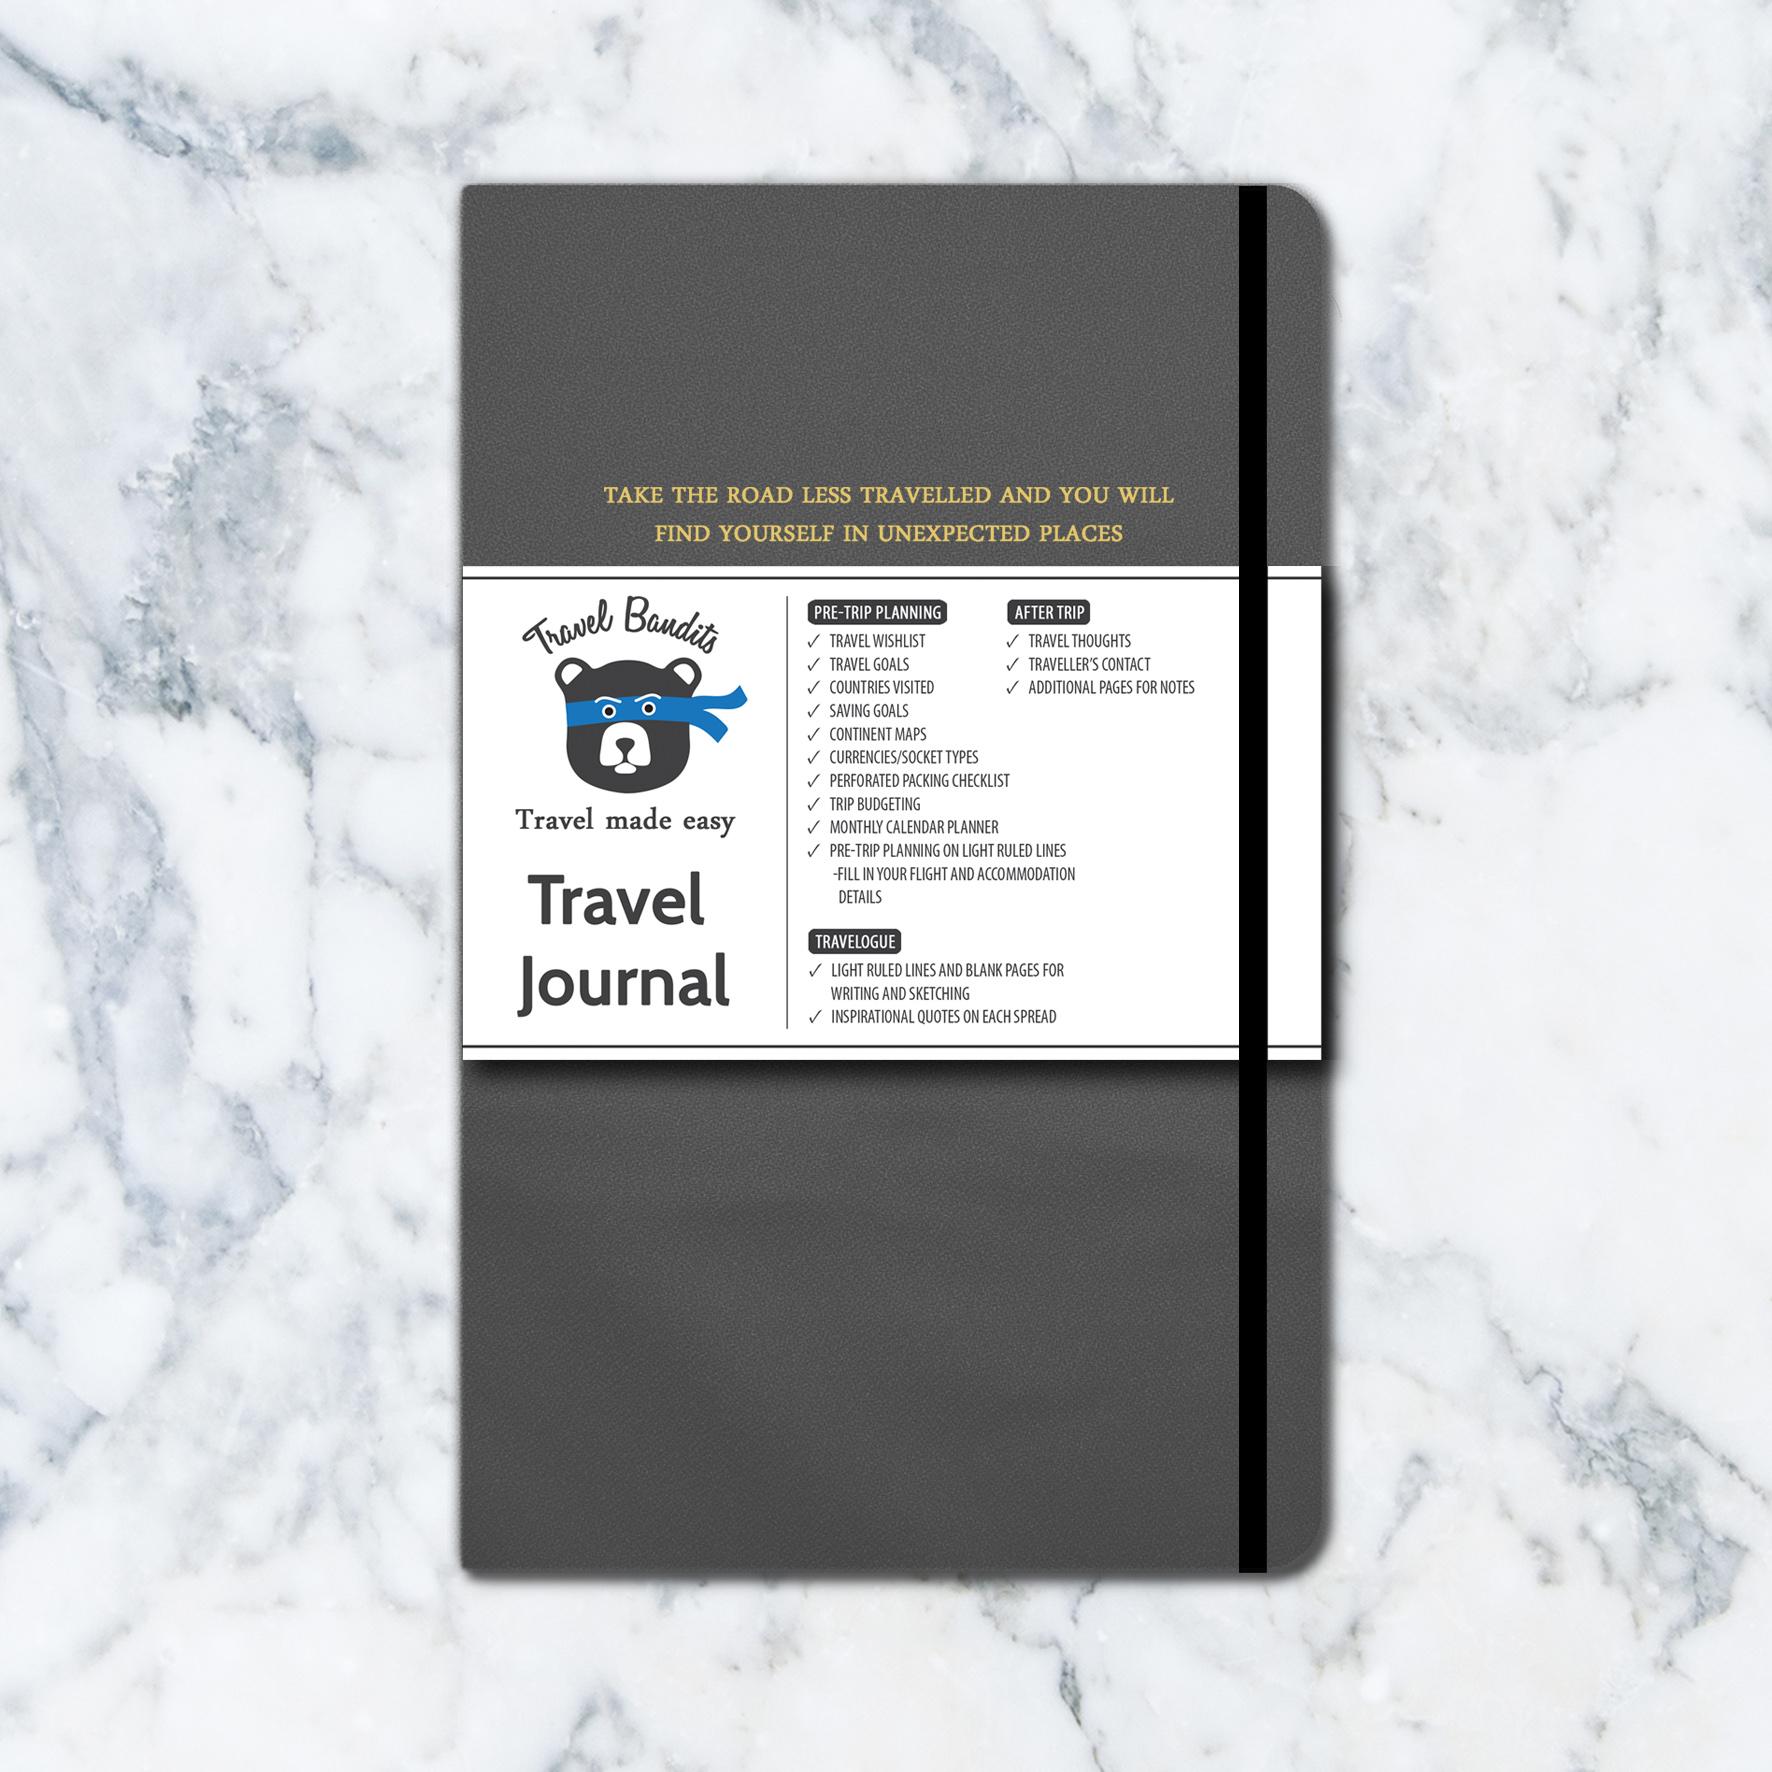 Travel Bandits Travel Journal